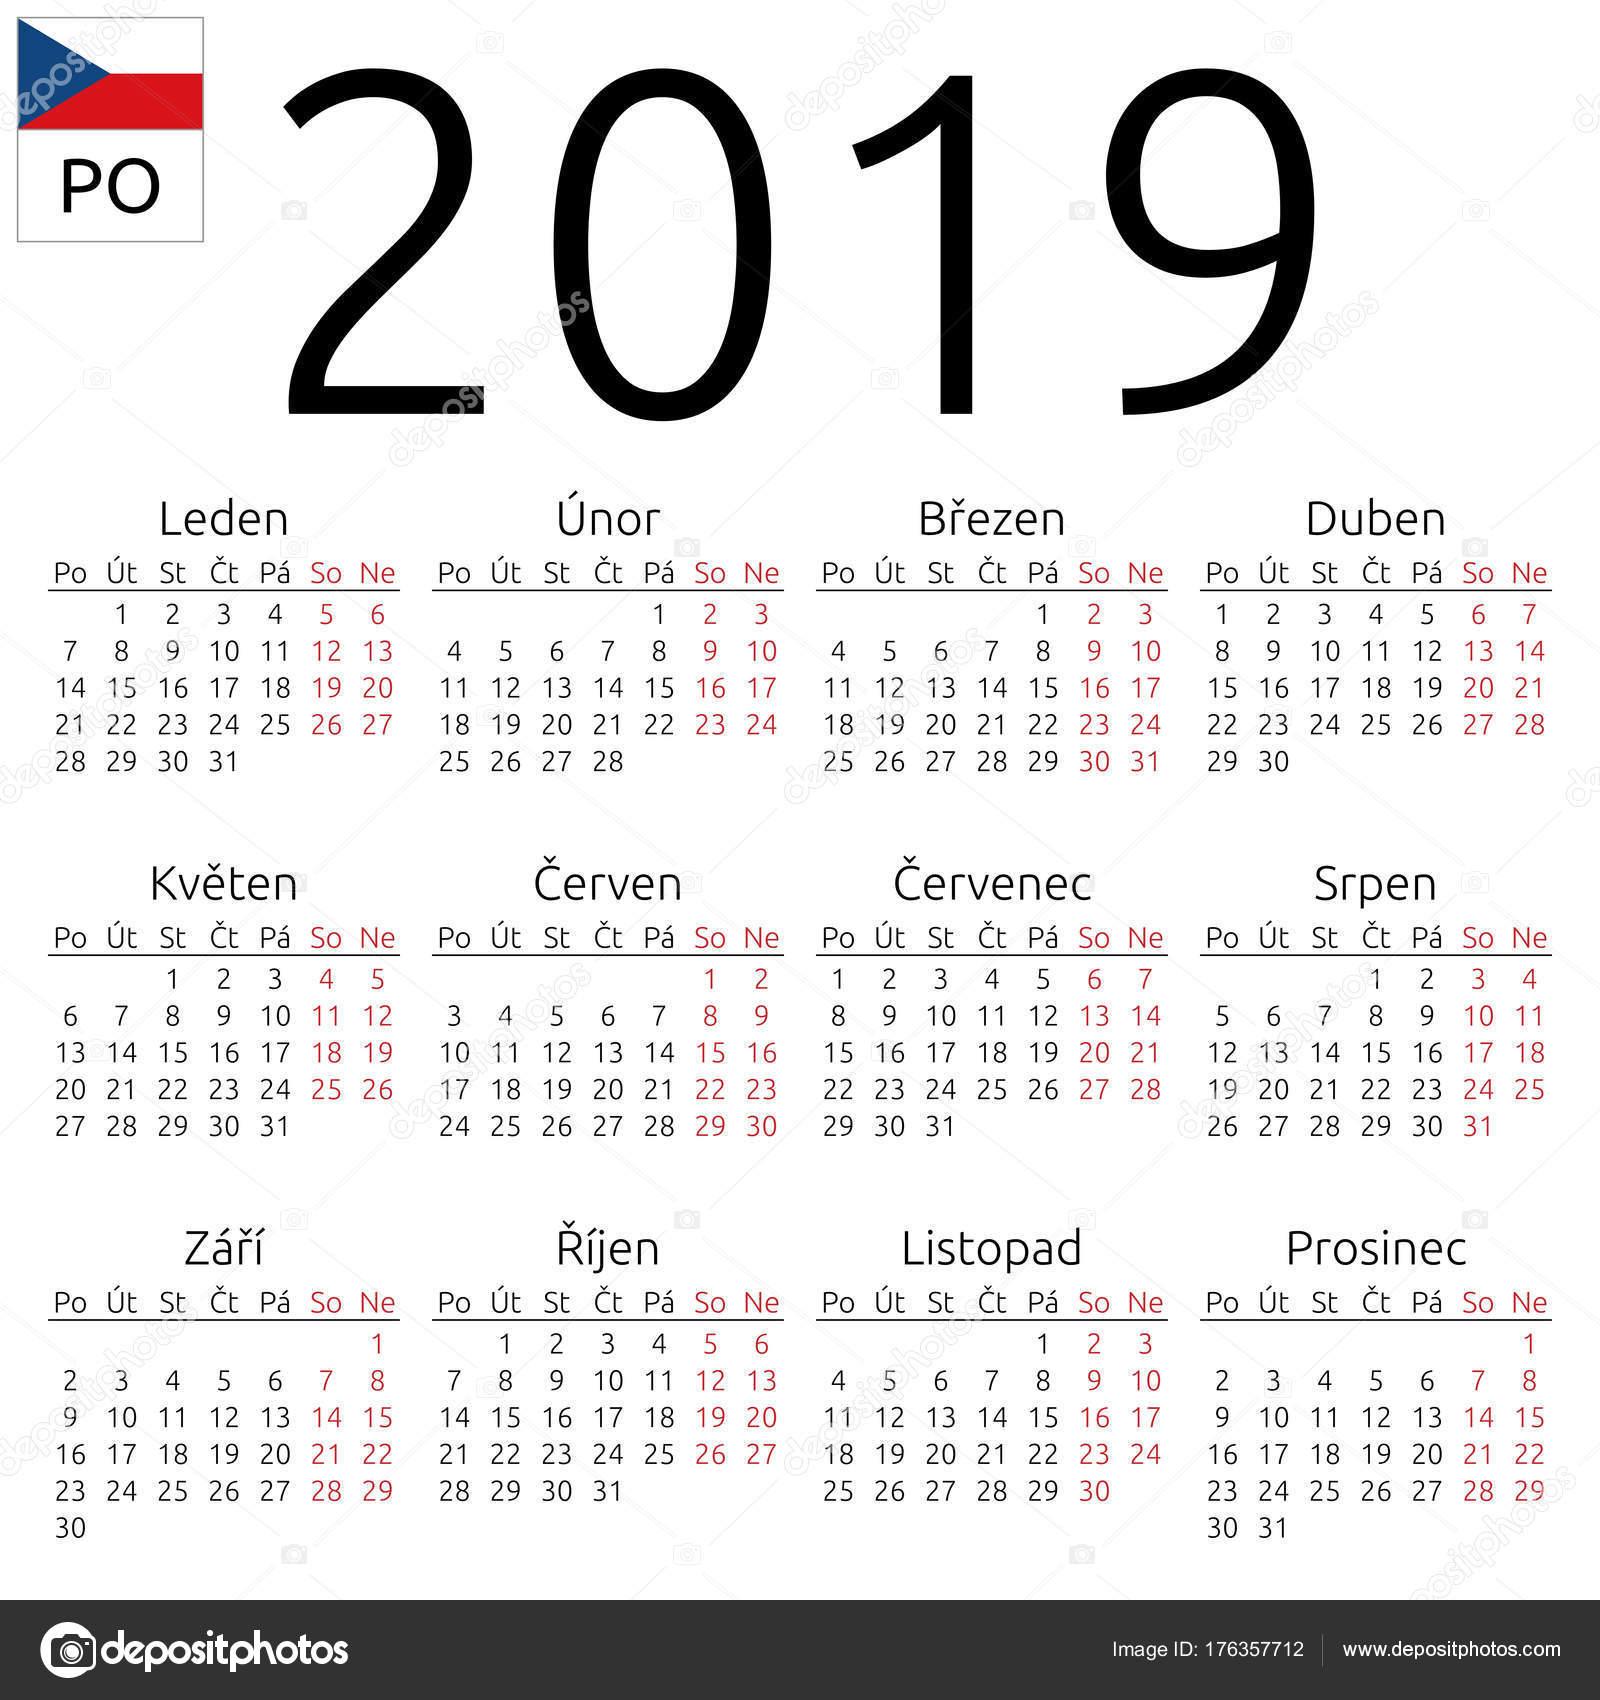 ünnepnapok 2019 naptár Naptár 2019, Cseh, hétfő — Stock Vektor © Dmitry_Guzhanin #176357712 ünnepnapok 2019 naptár